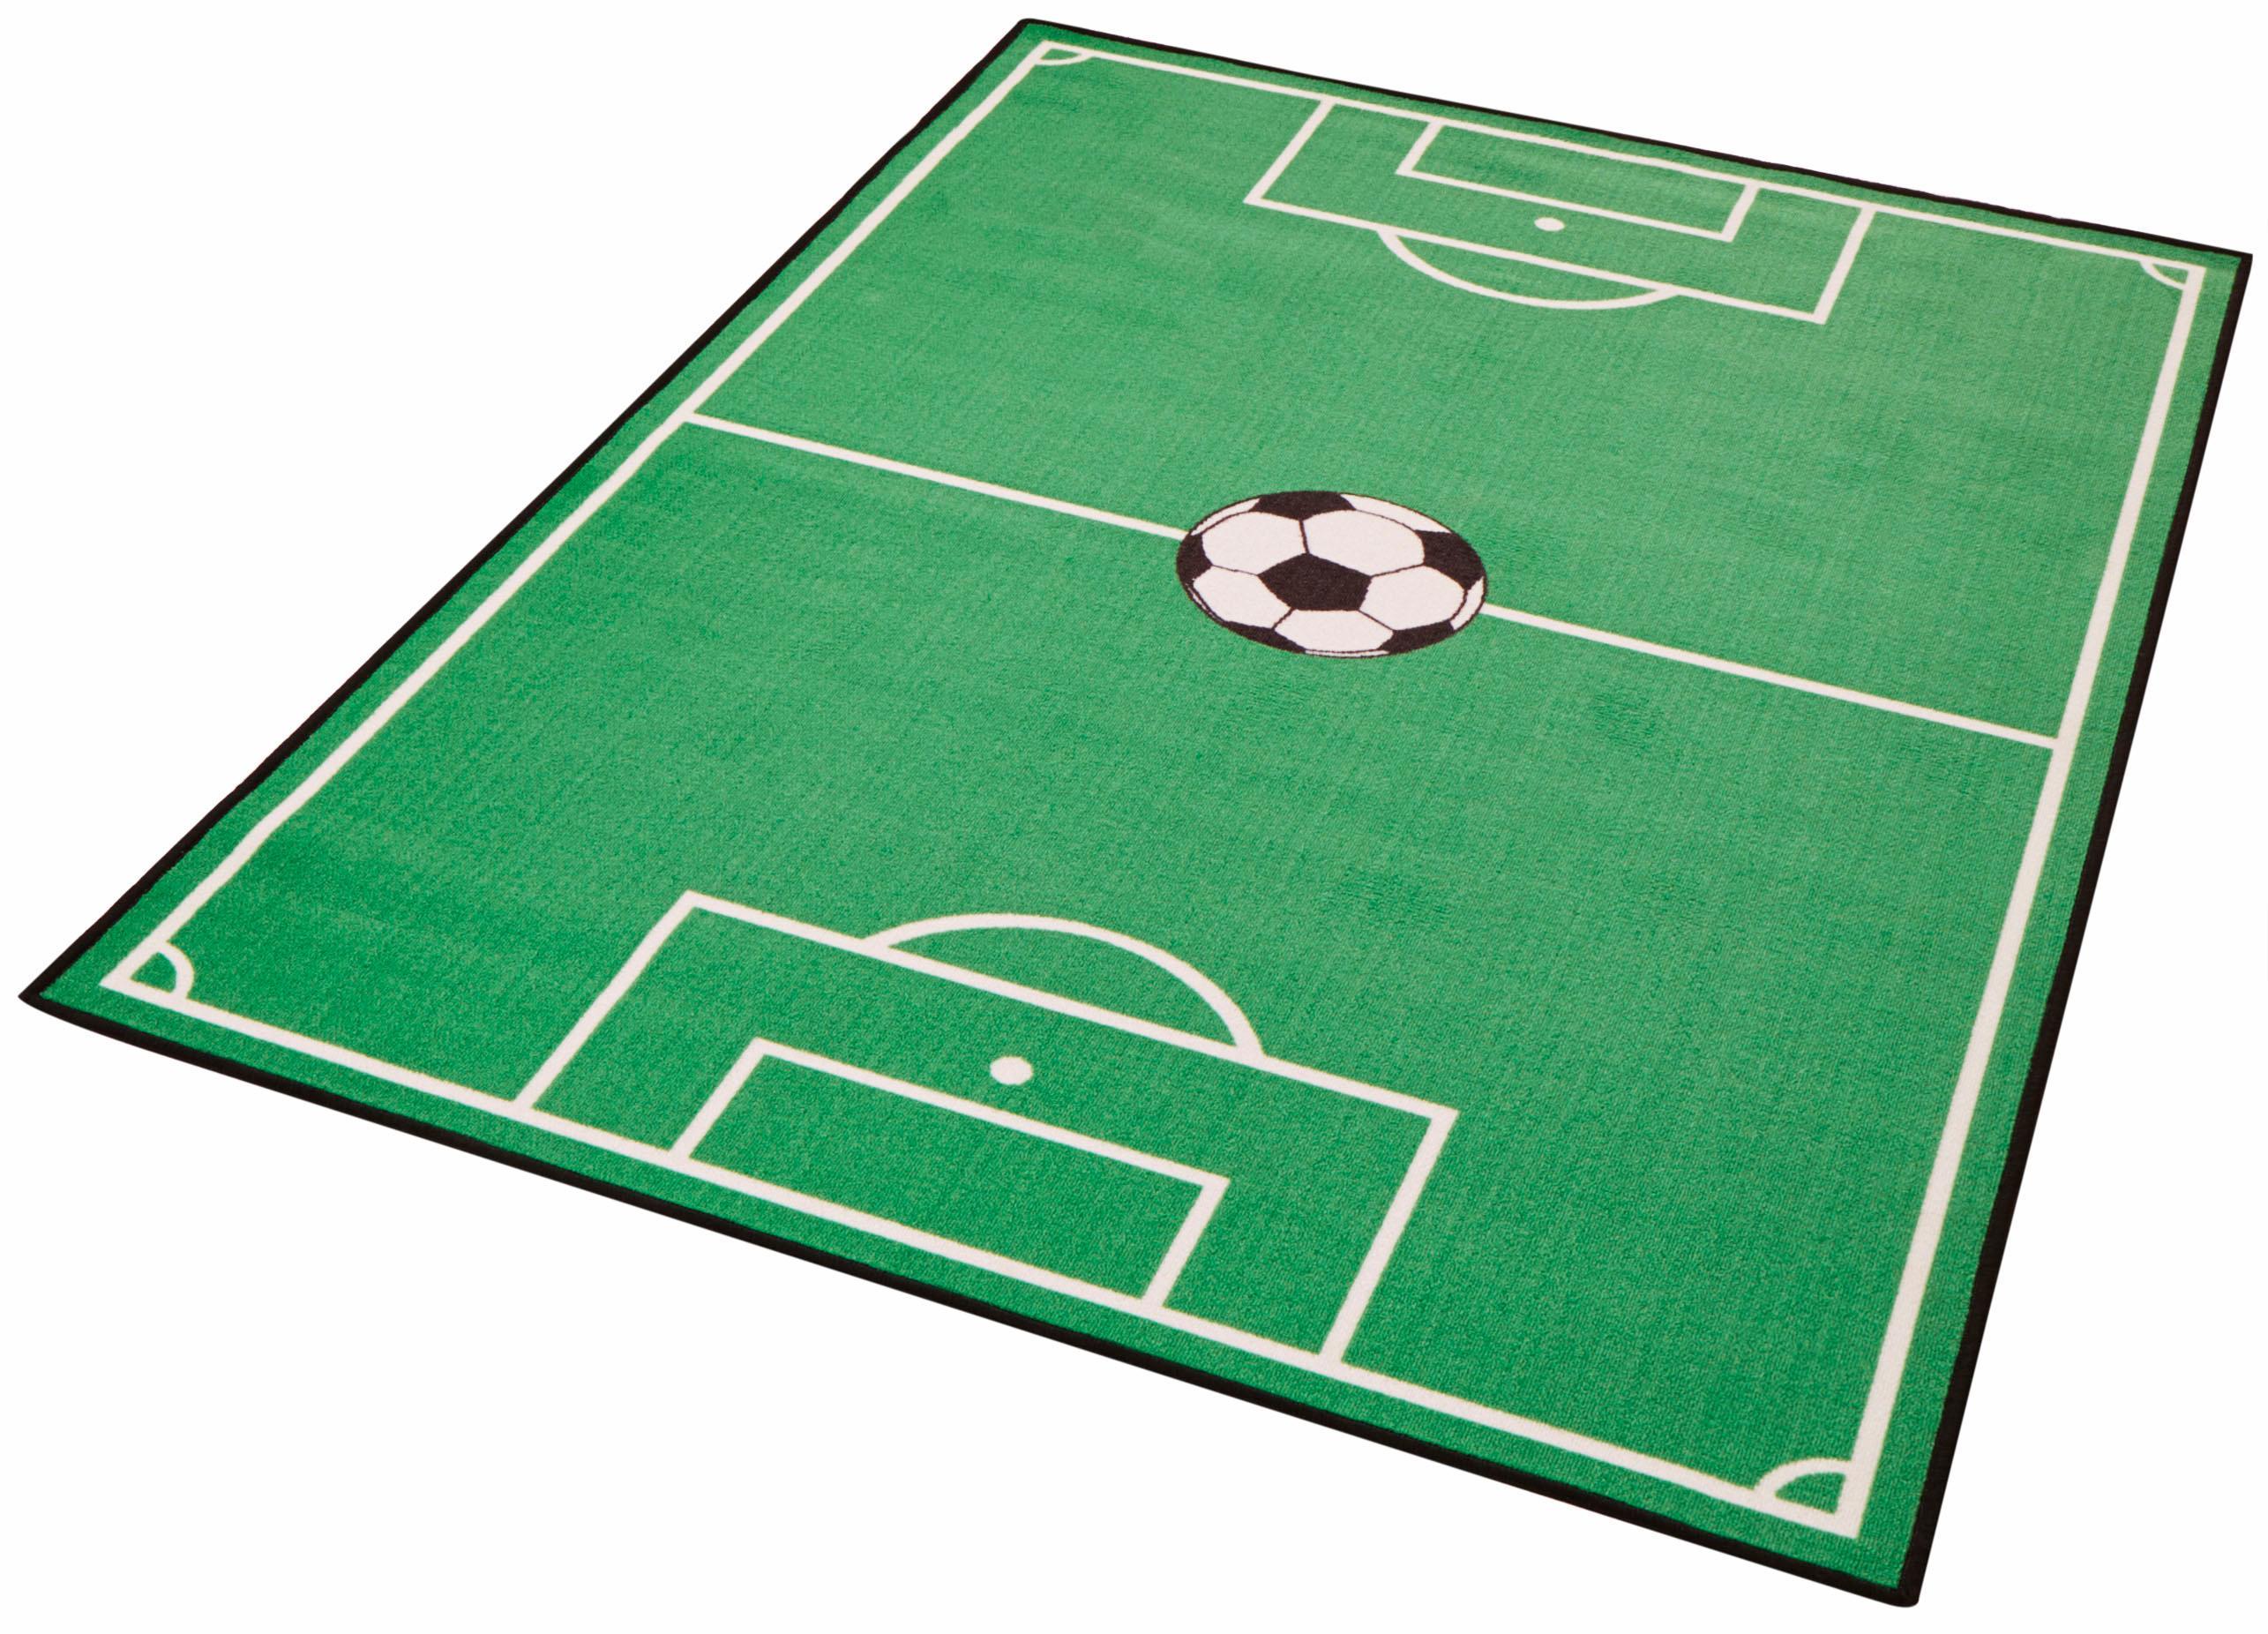 Kinderteppich Fußballfeld 1 Zala Living rechteckig Höhe 8 mm